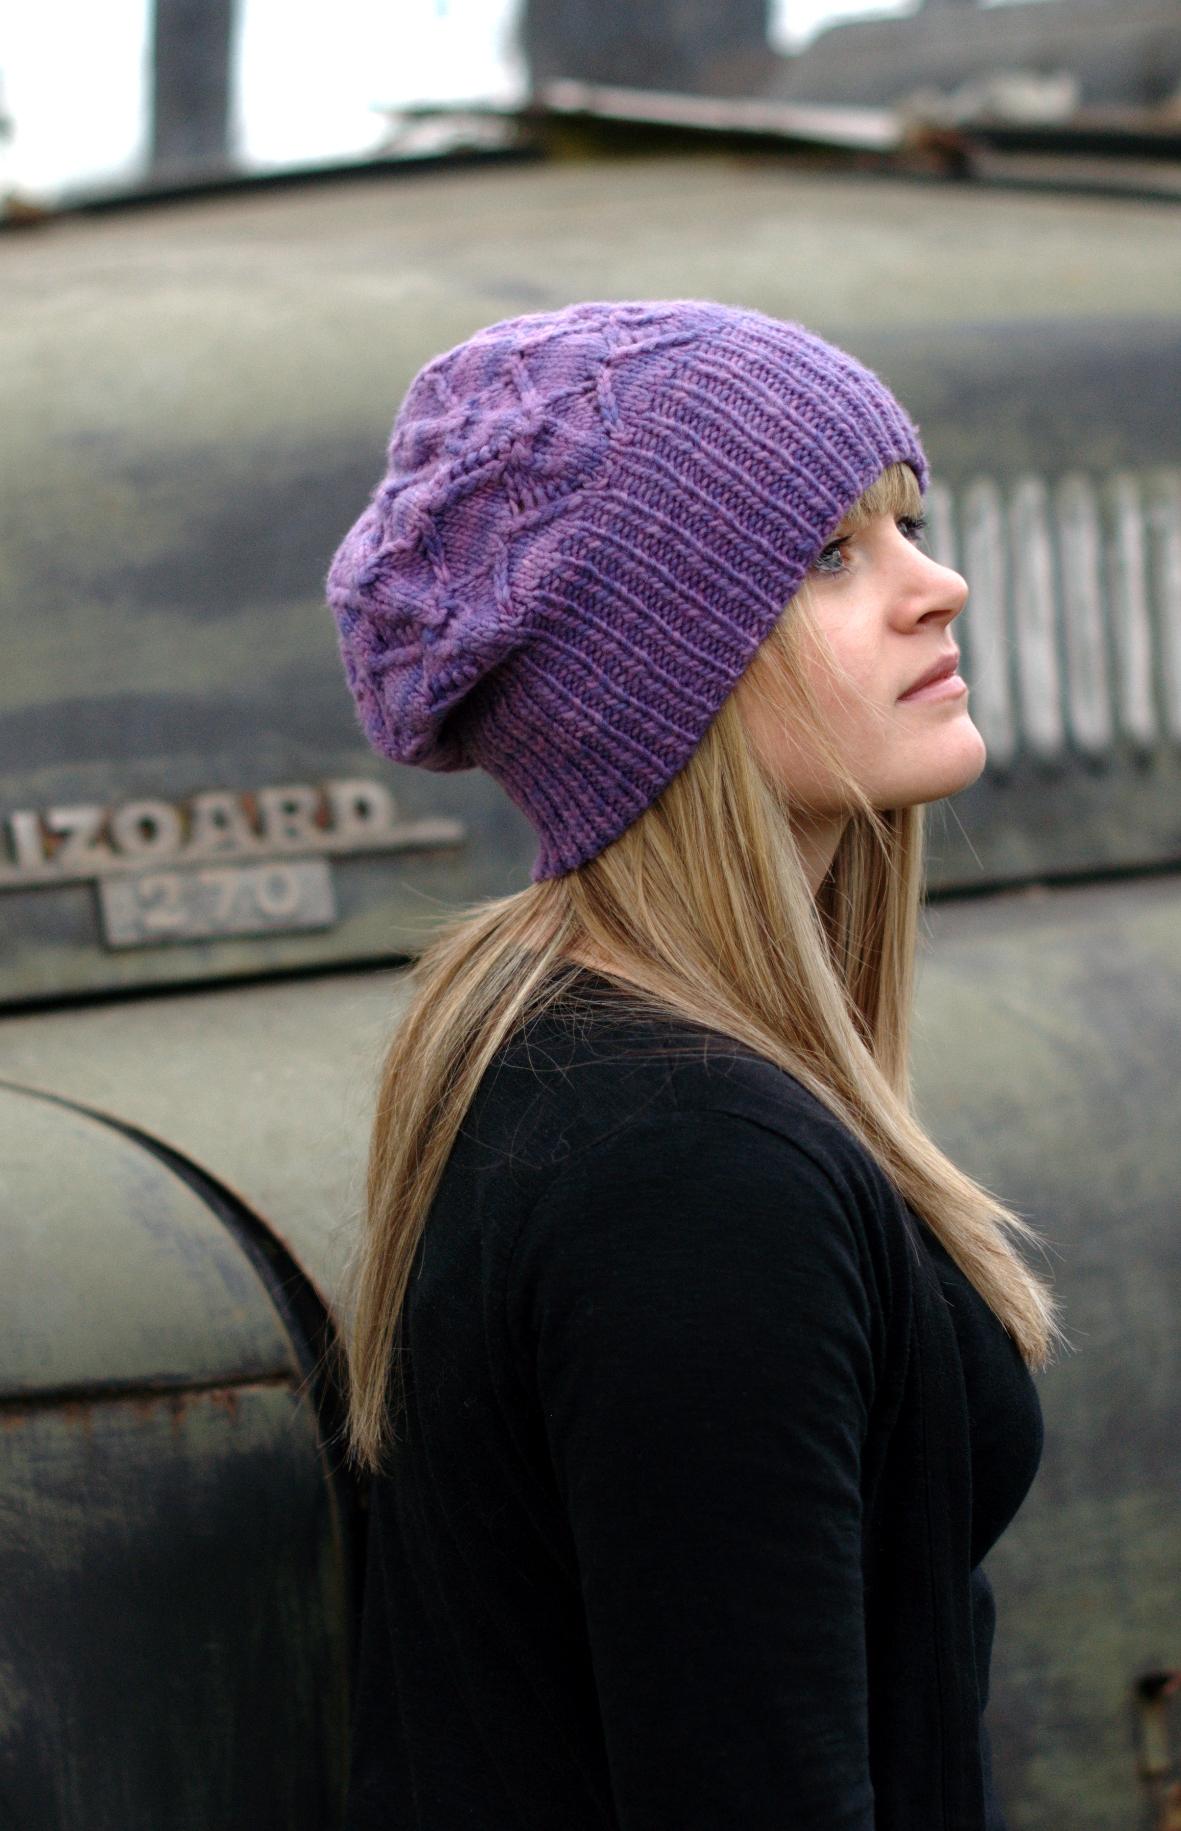 Starburst slouchy lace Hat knitting pattern